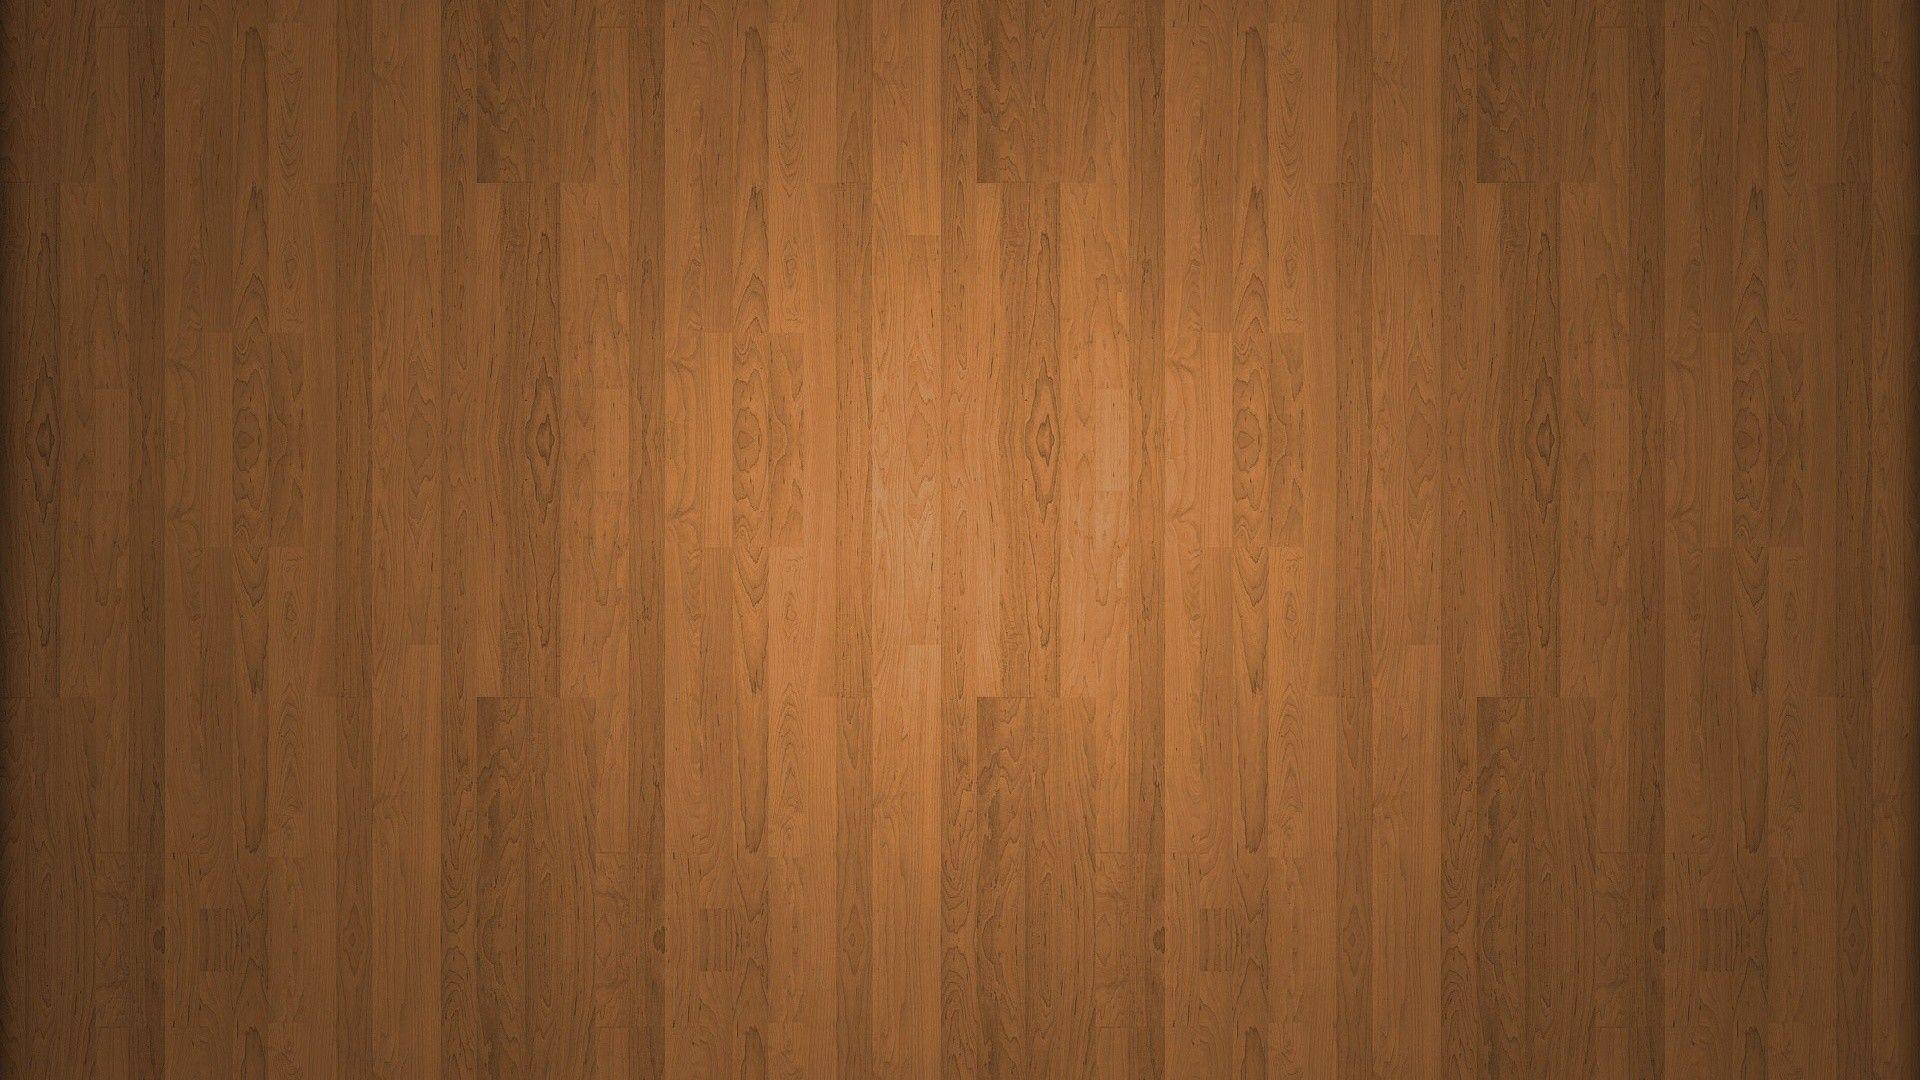 Pix For Wood Paneling Desktop Wallpaper